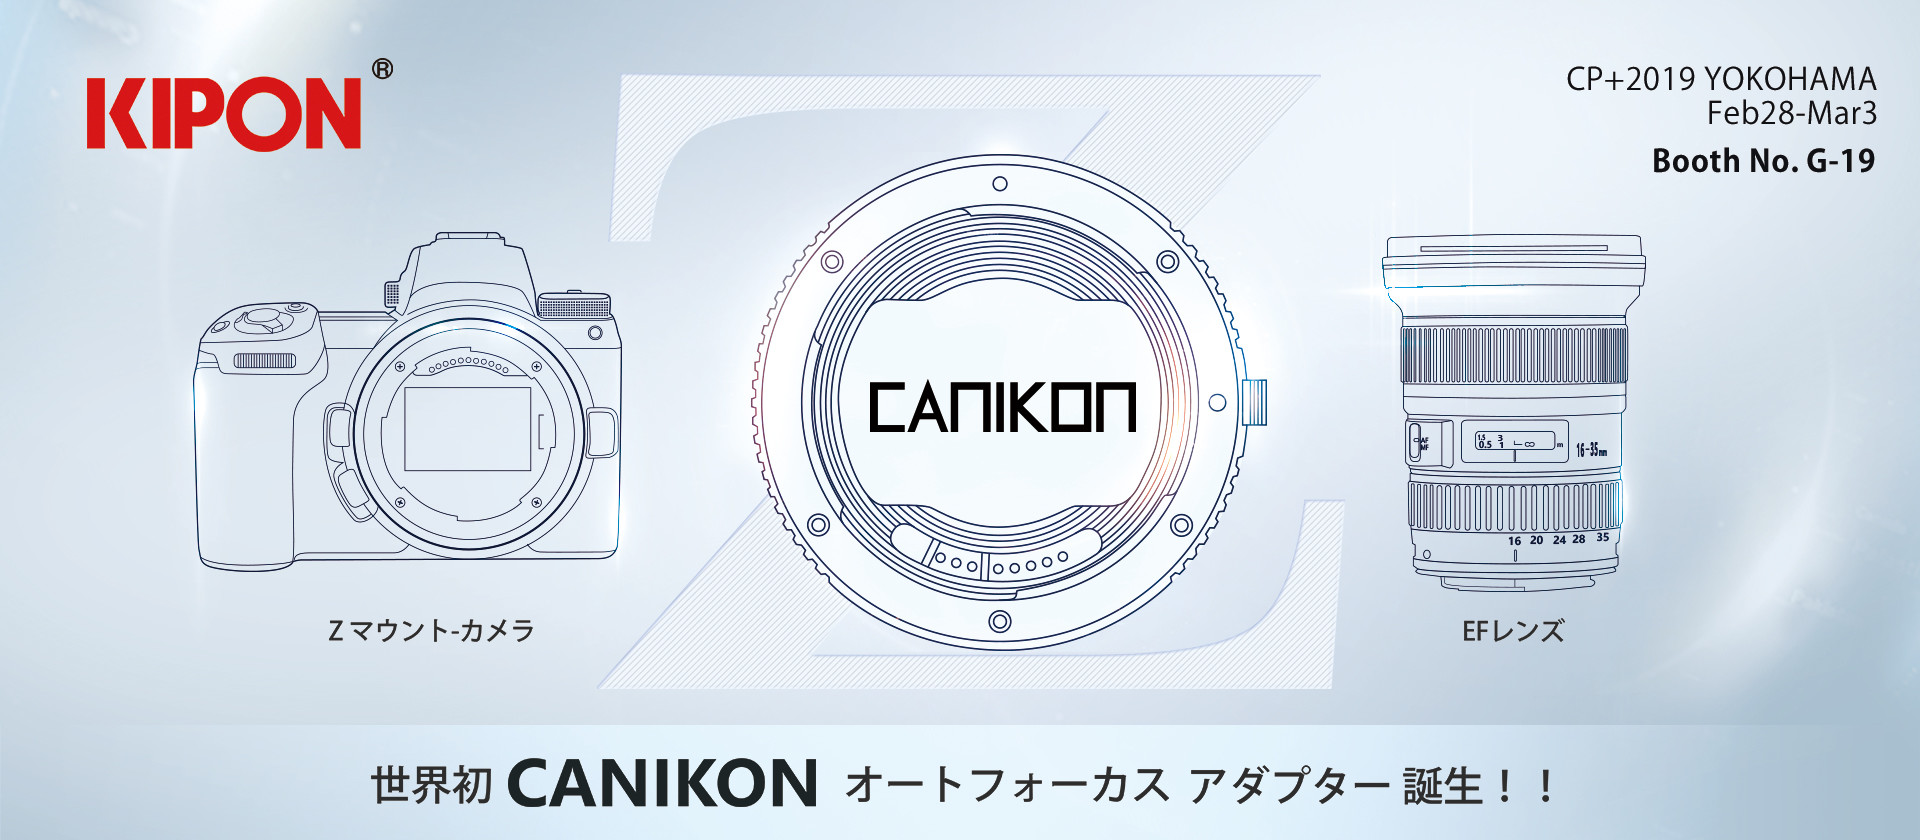 Canon EF lens mount, , , , Autofocus, , Kipon, Nikon Z-mount, Tamron, Canon, design, Line, Technical drawing, Font, Diagram, Circle